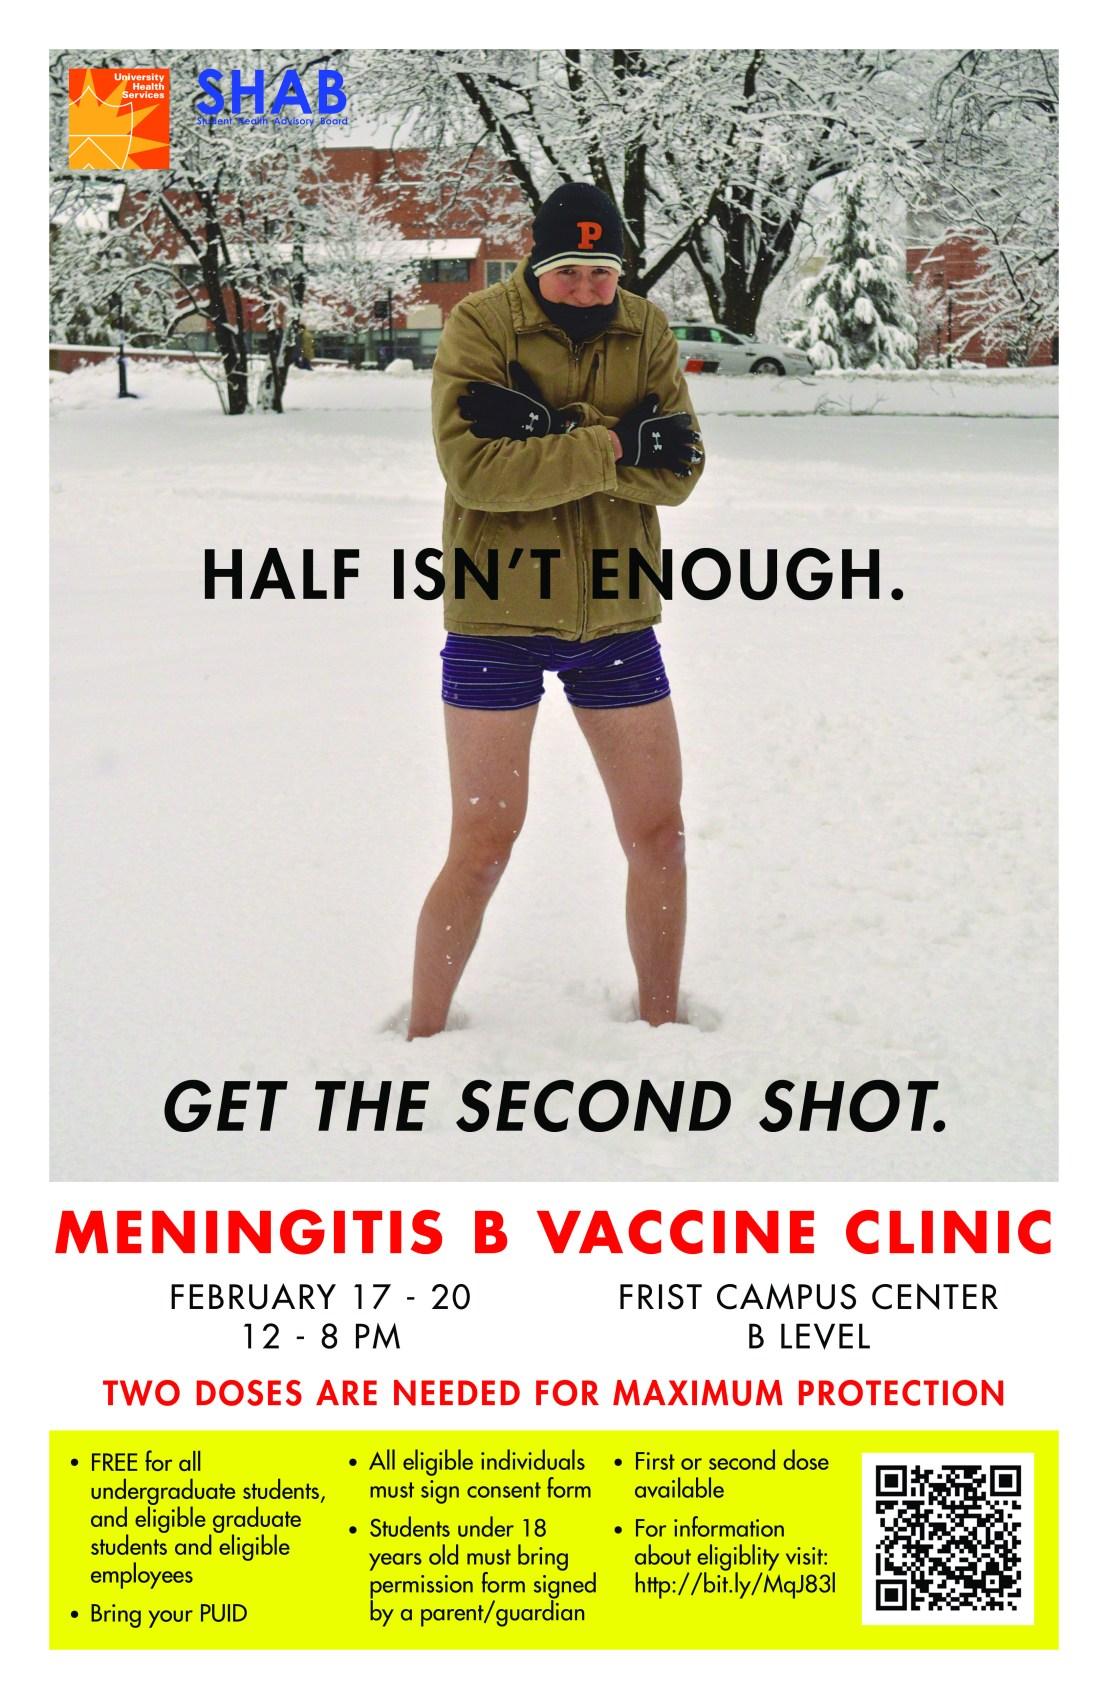 Meningitis B vaccination poster during an outbreak at Princeton.